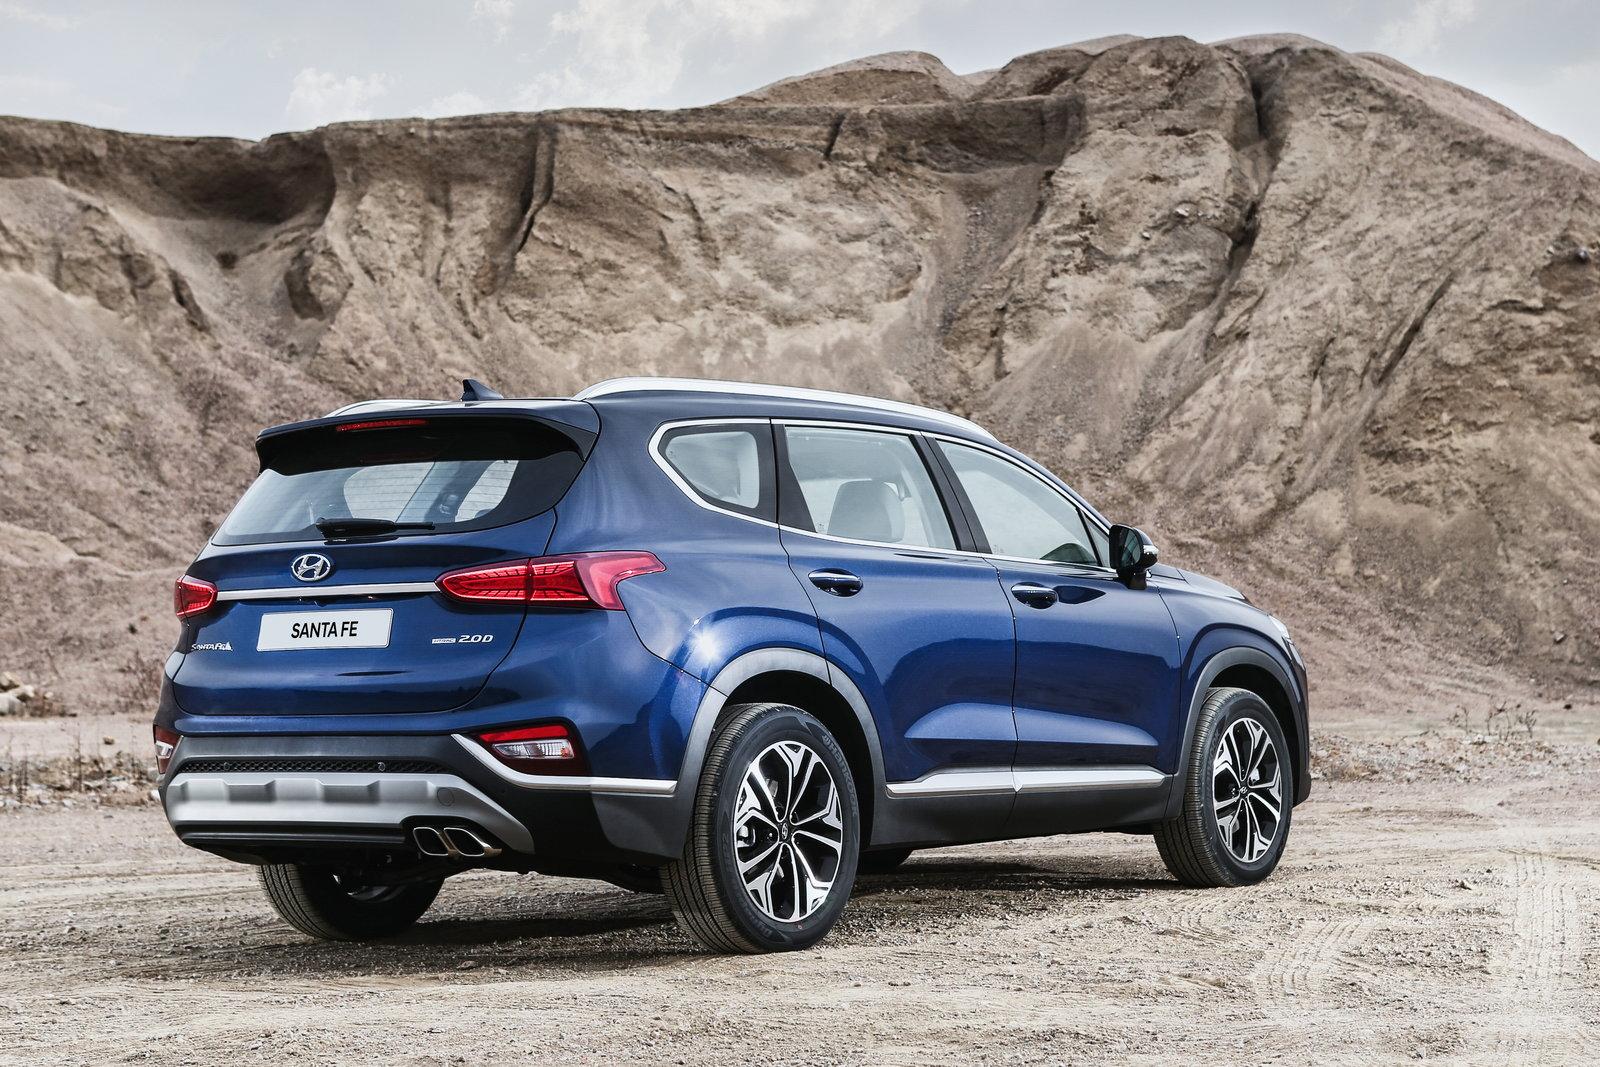 2019 Hyundai Santa Fe Redesign Info Pricing Release